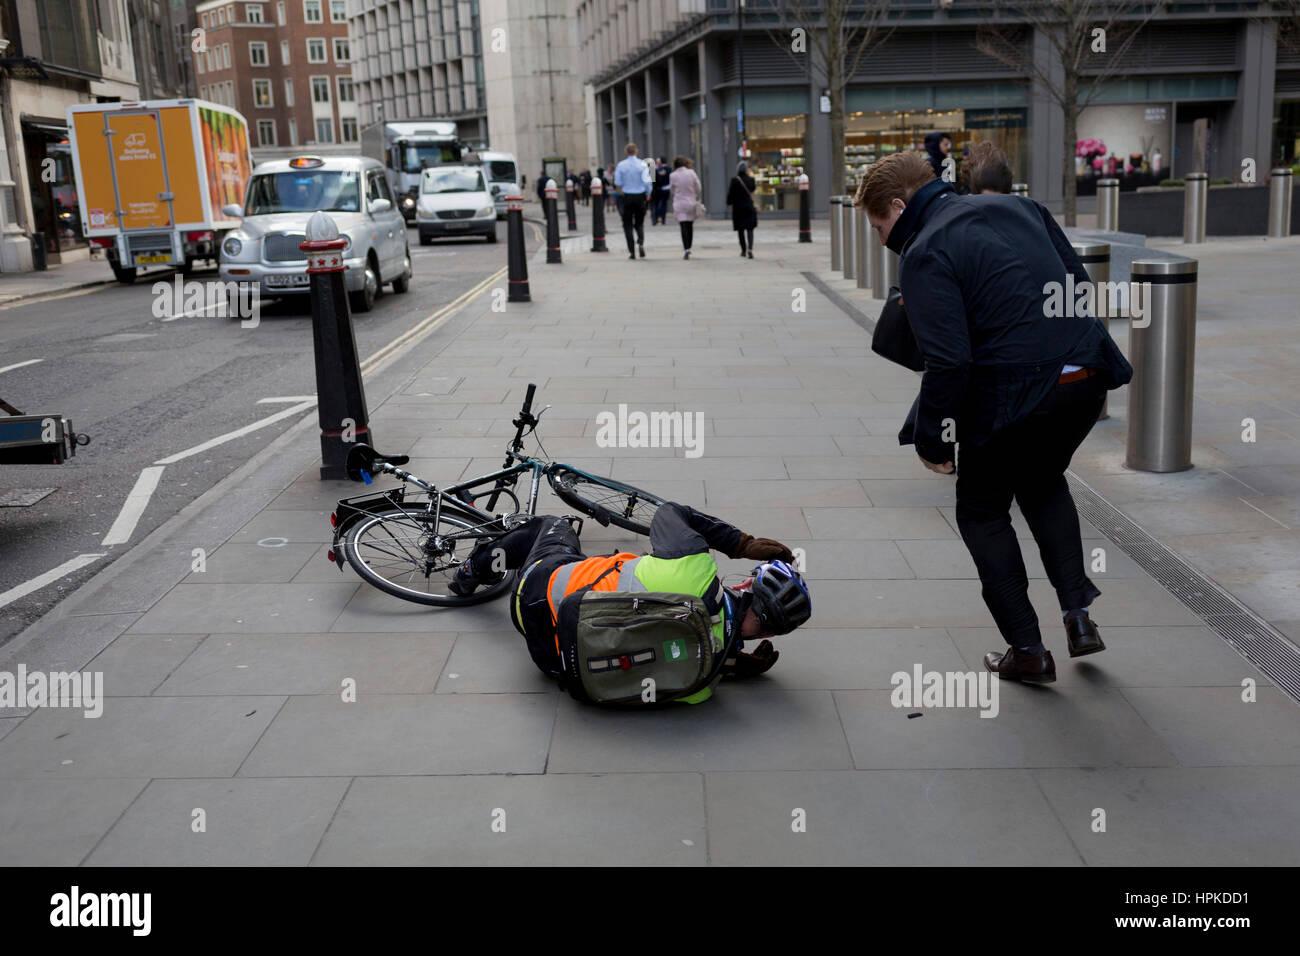 london-uk-23rd-february-2017-a-cyclist-l